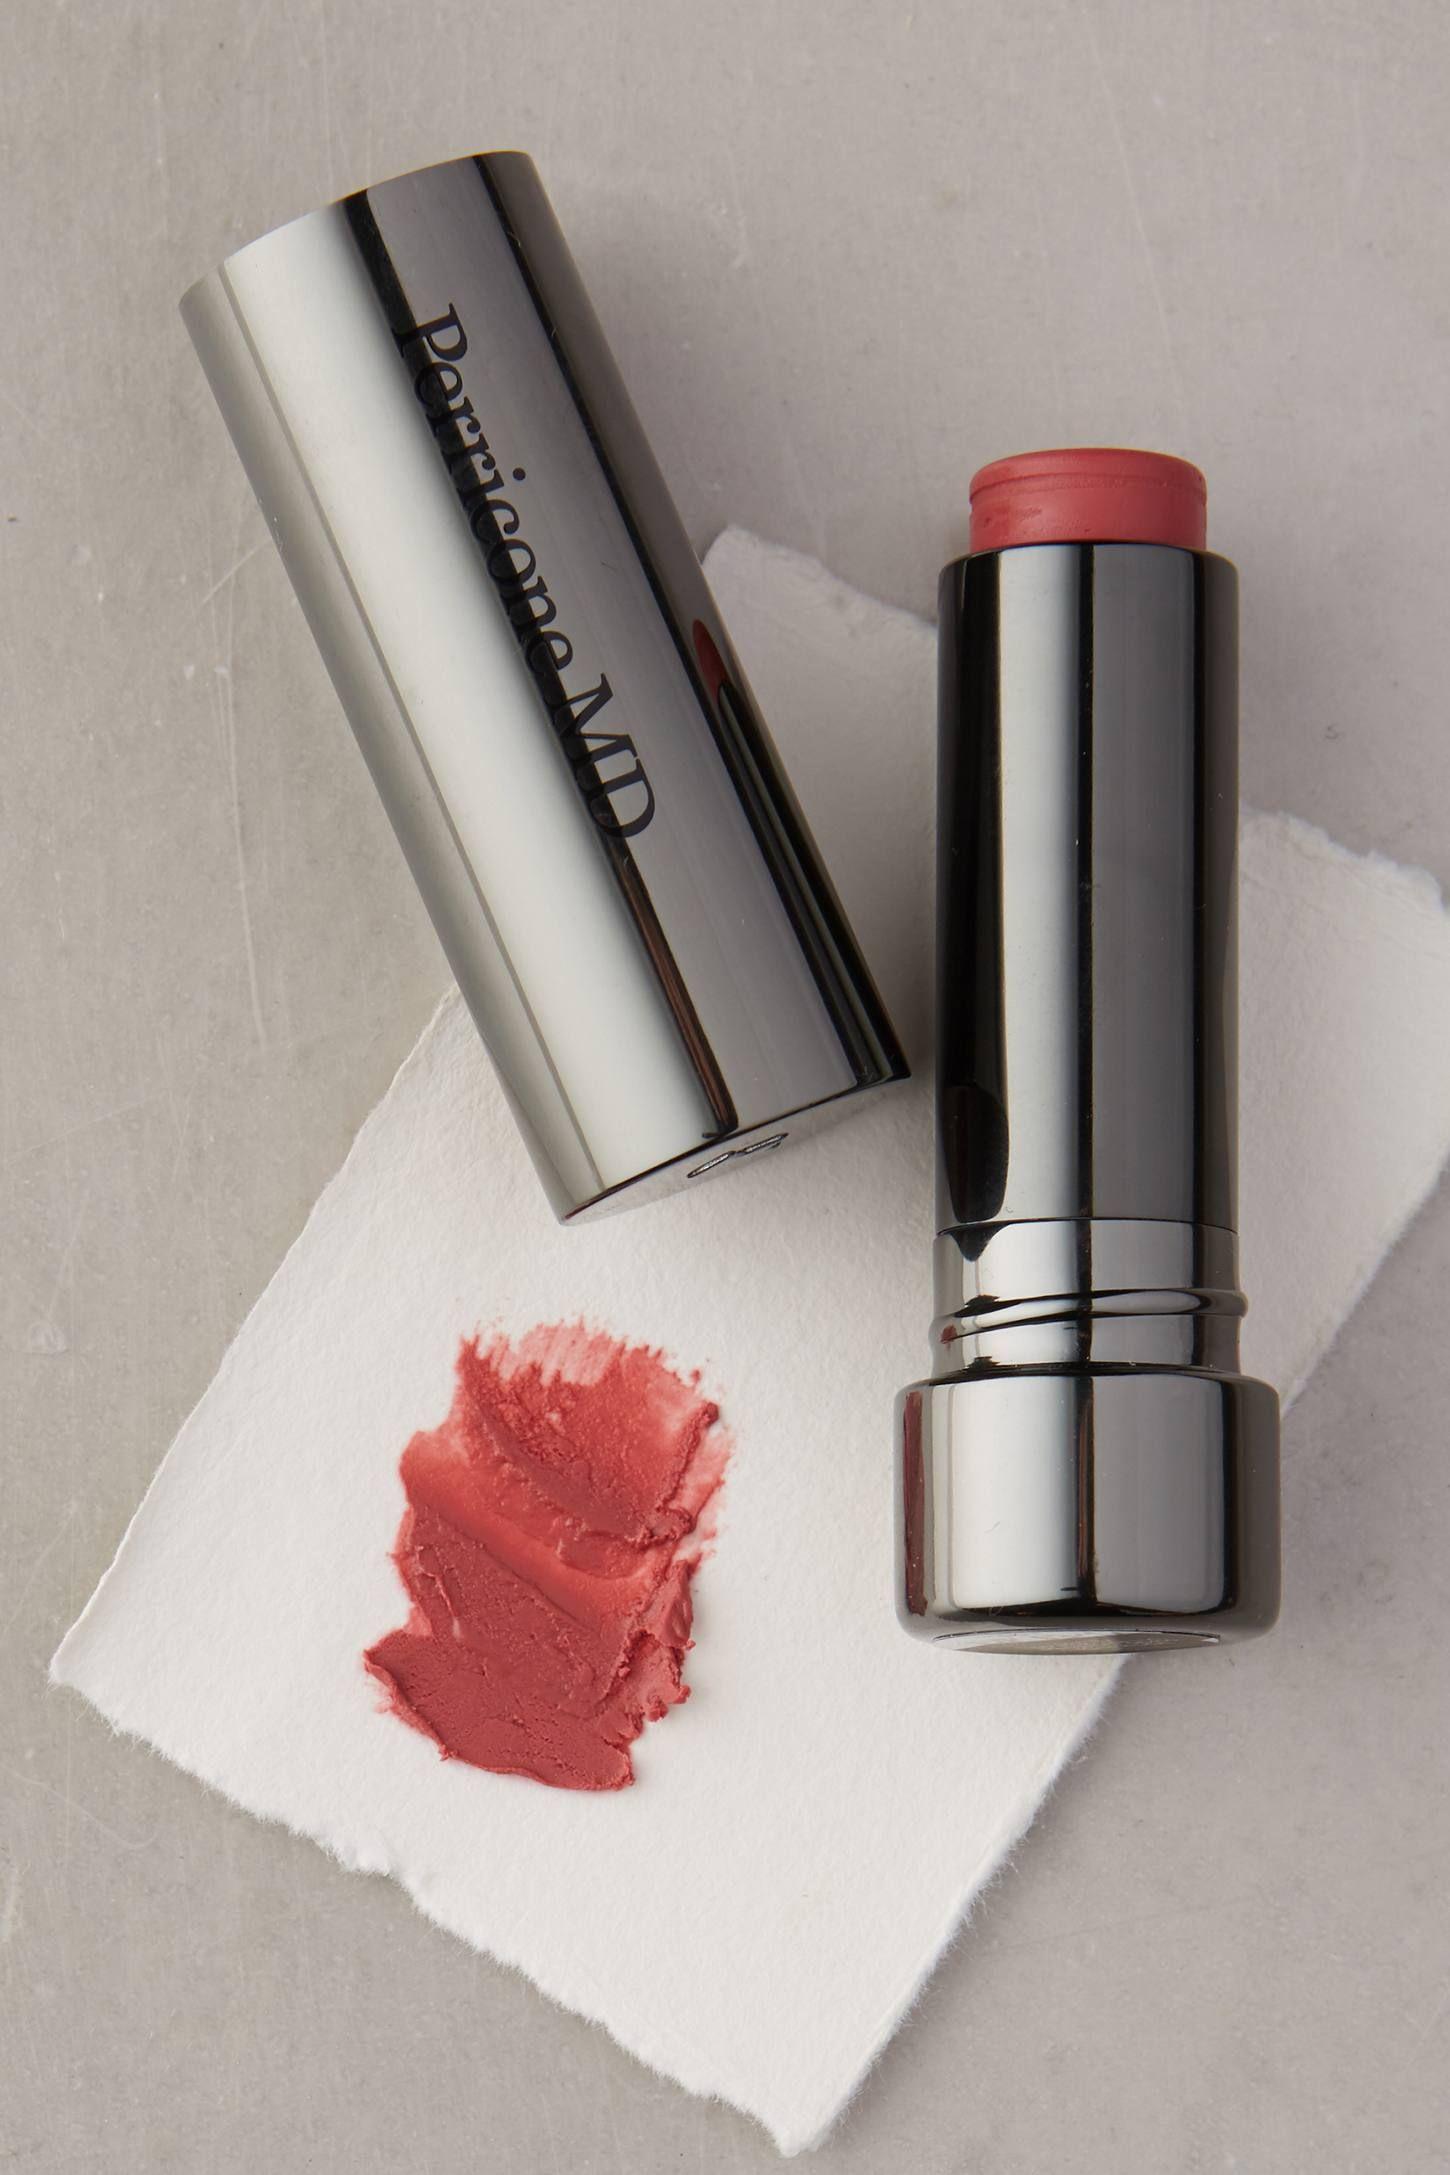 Perricone MD No Lipstick Lipstick Mac cosméticos, Istas